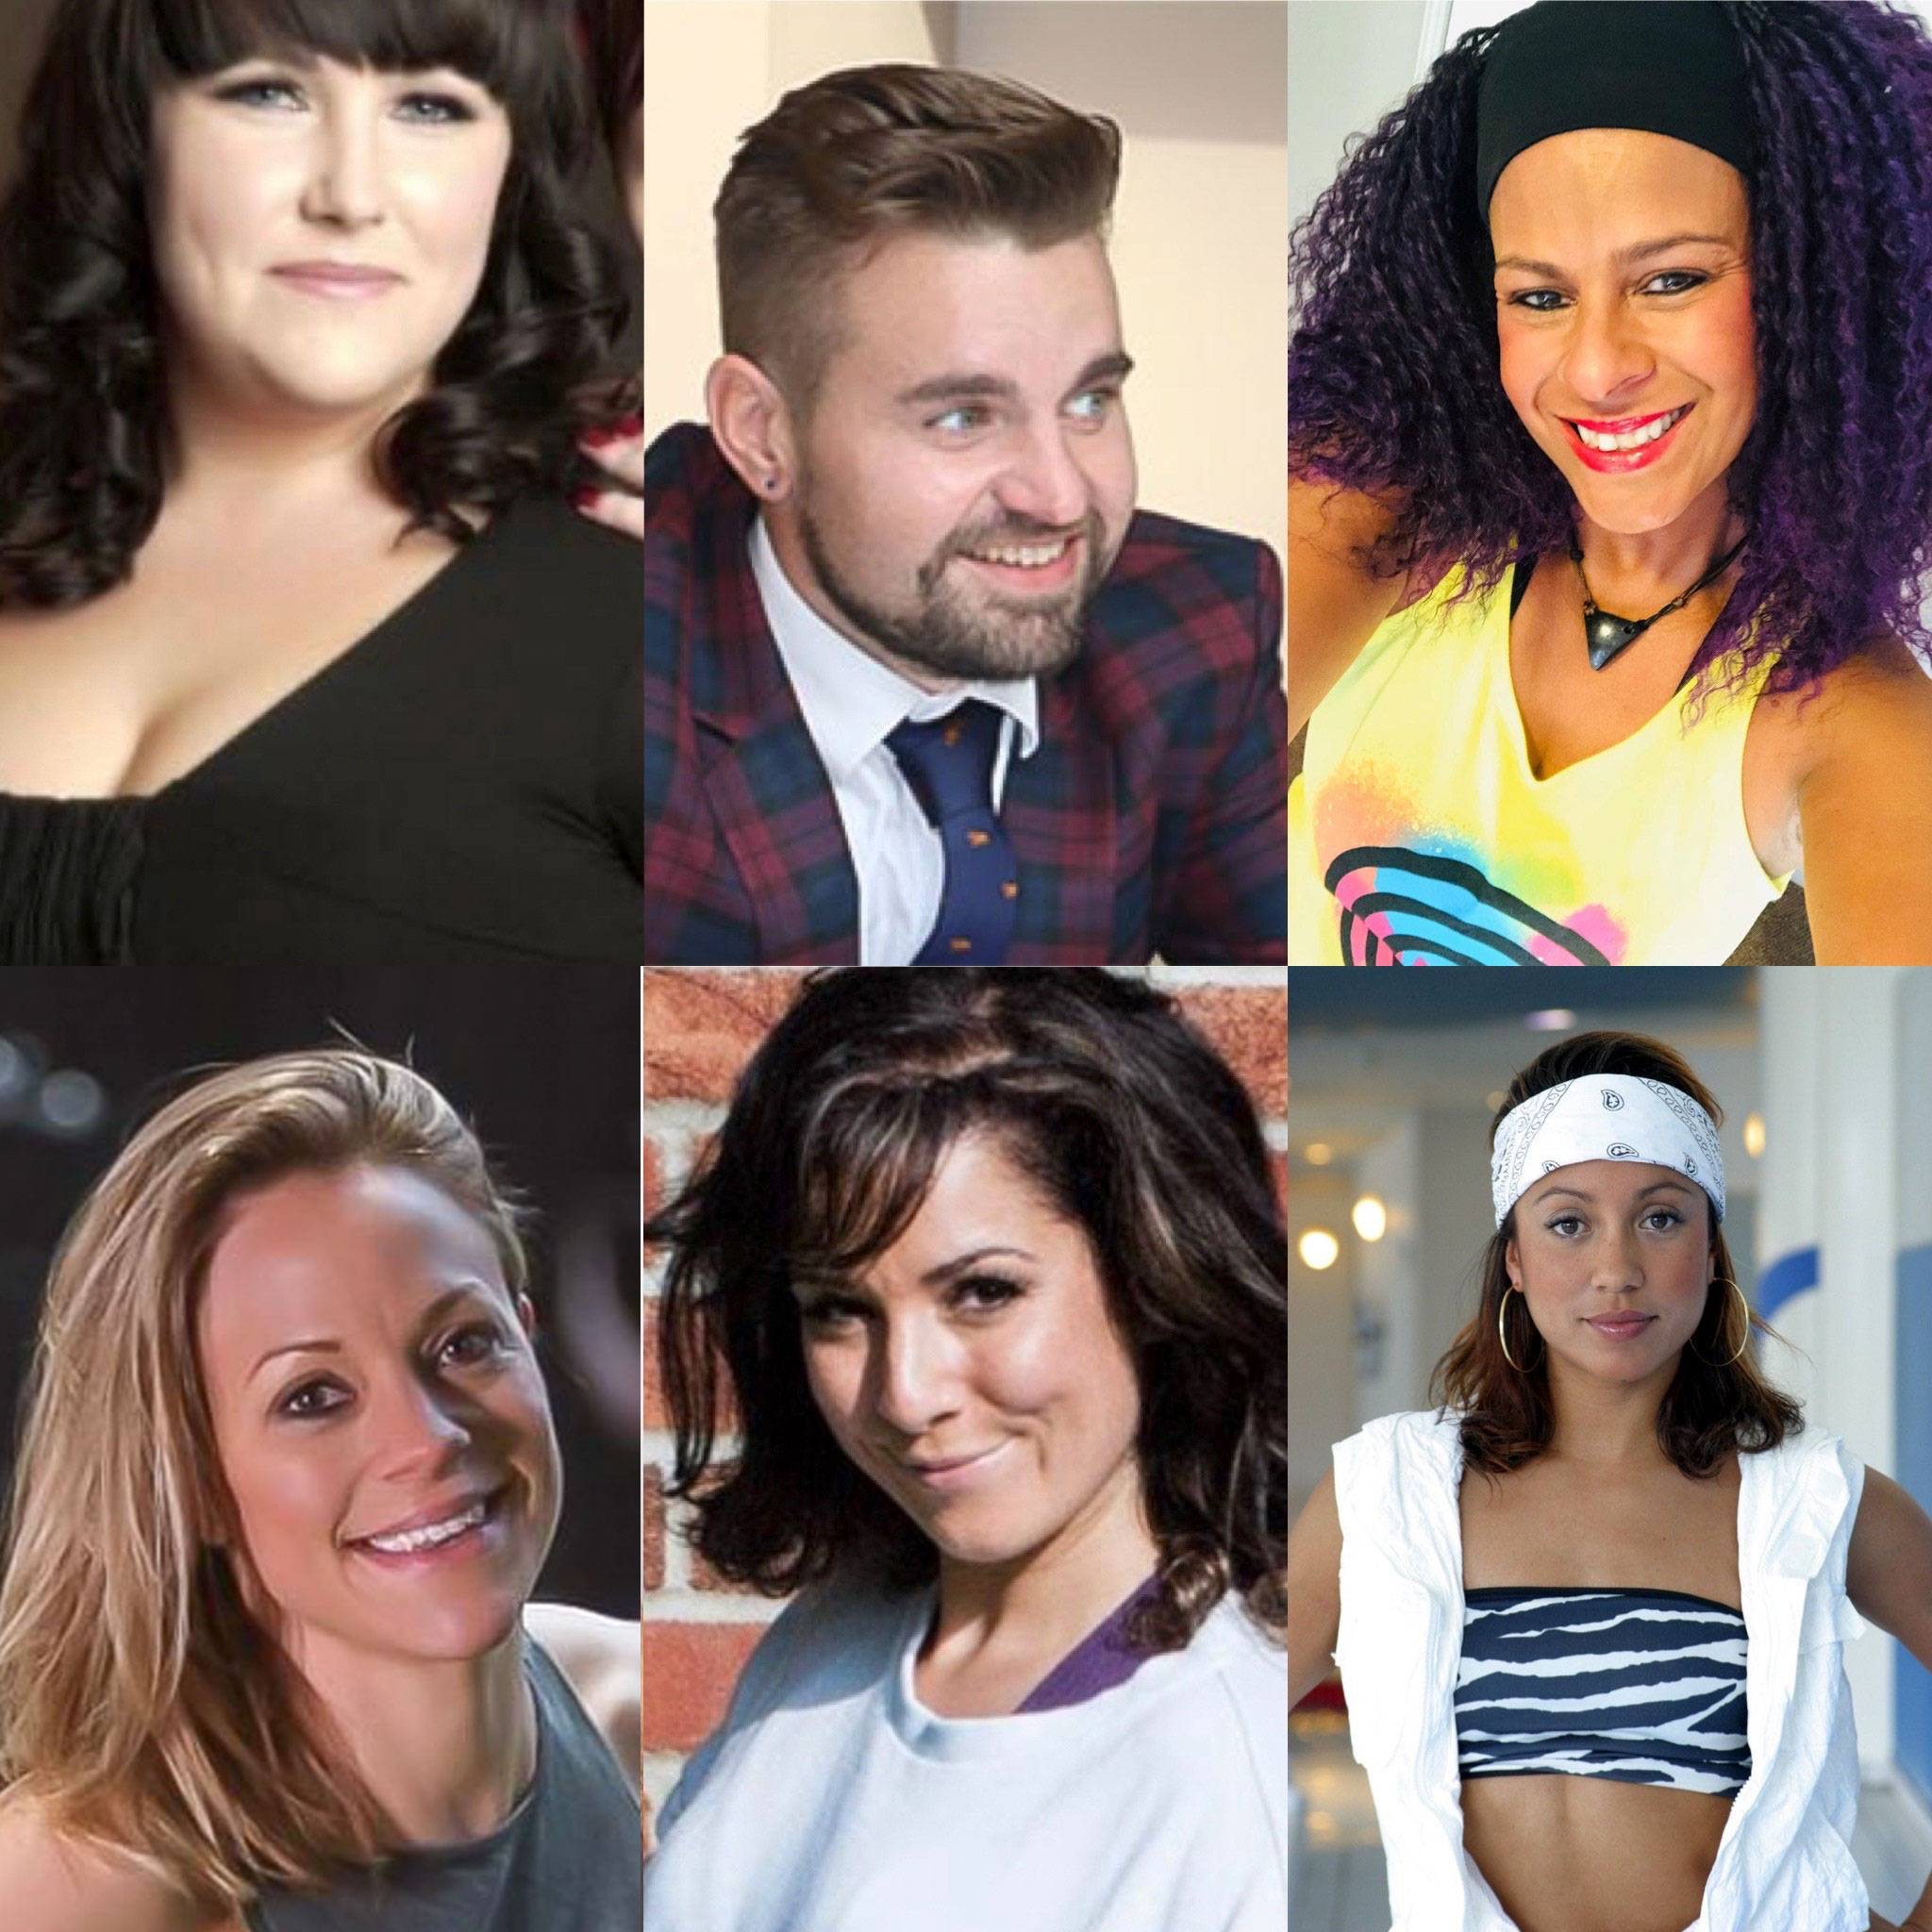 Stacey Sneddon, Ryan Graham, Sonique Smith, Anna Martin, Naomi Di Fabio, Lisa Brockwell